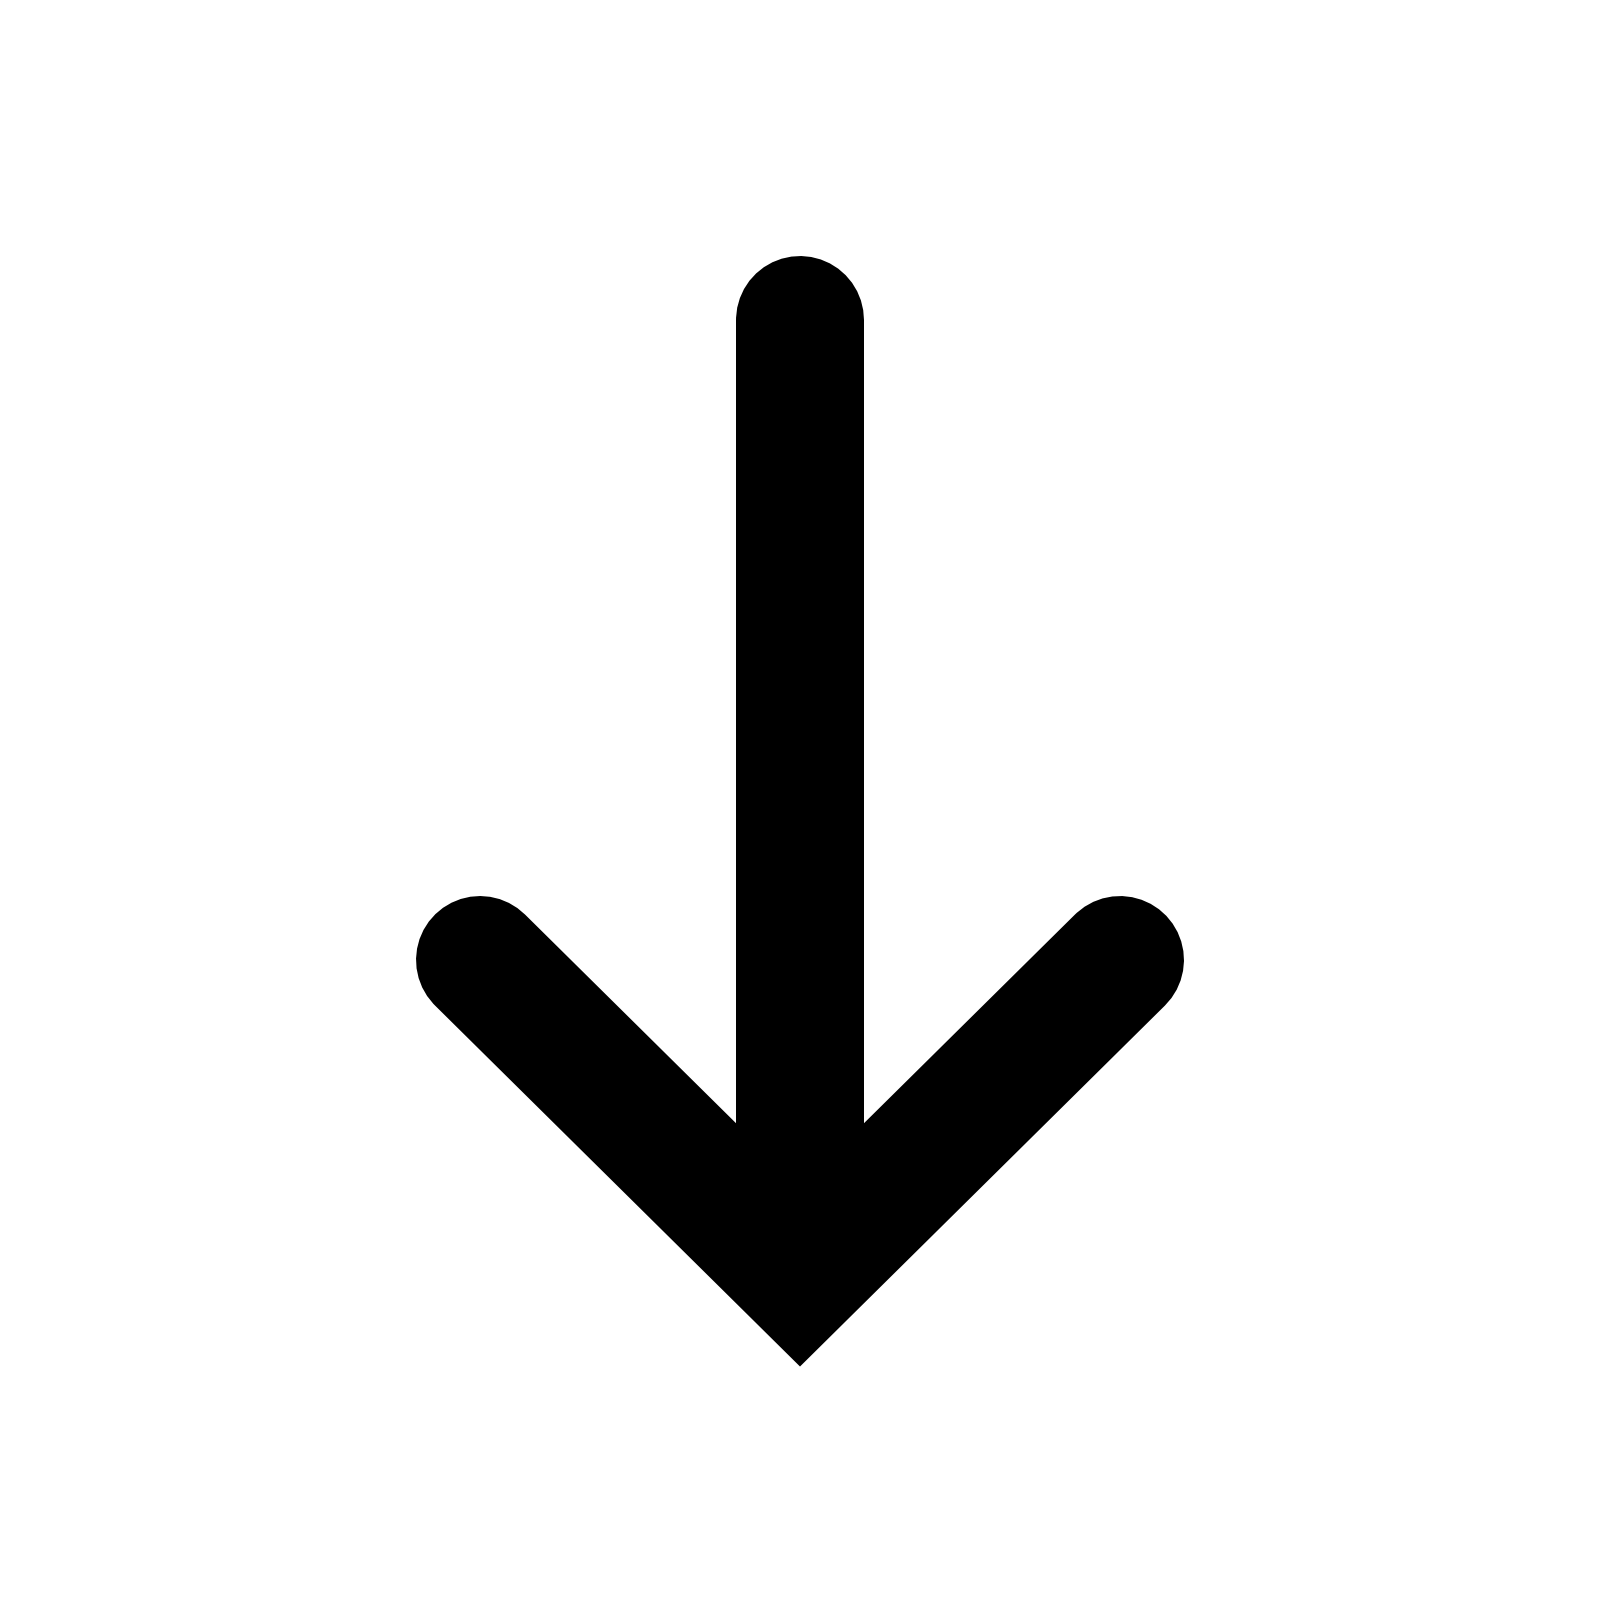 Logo Arrow PNG - 103563